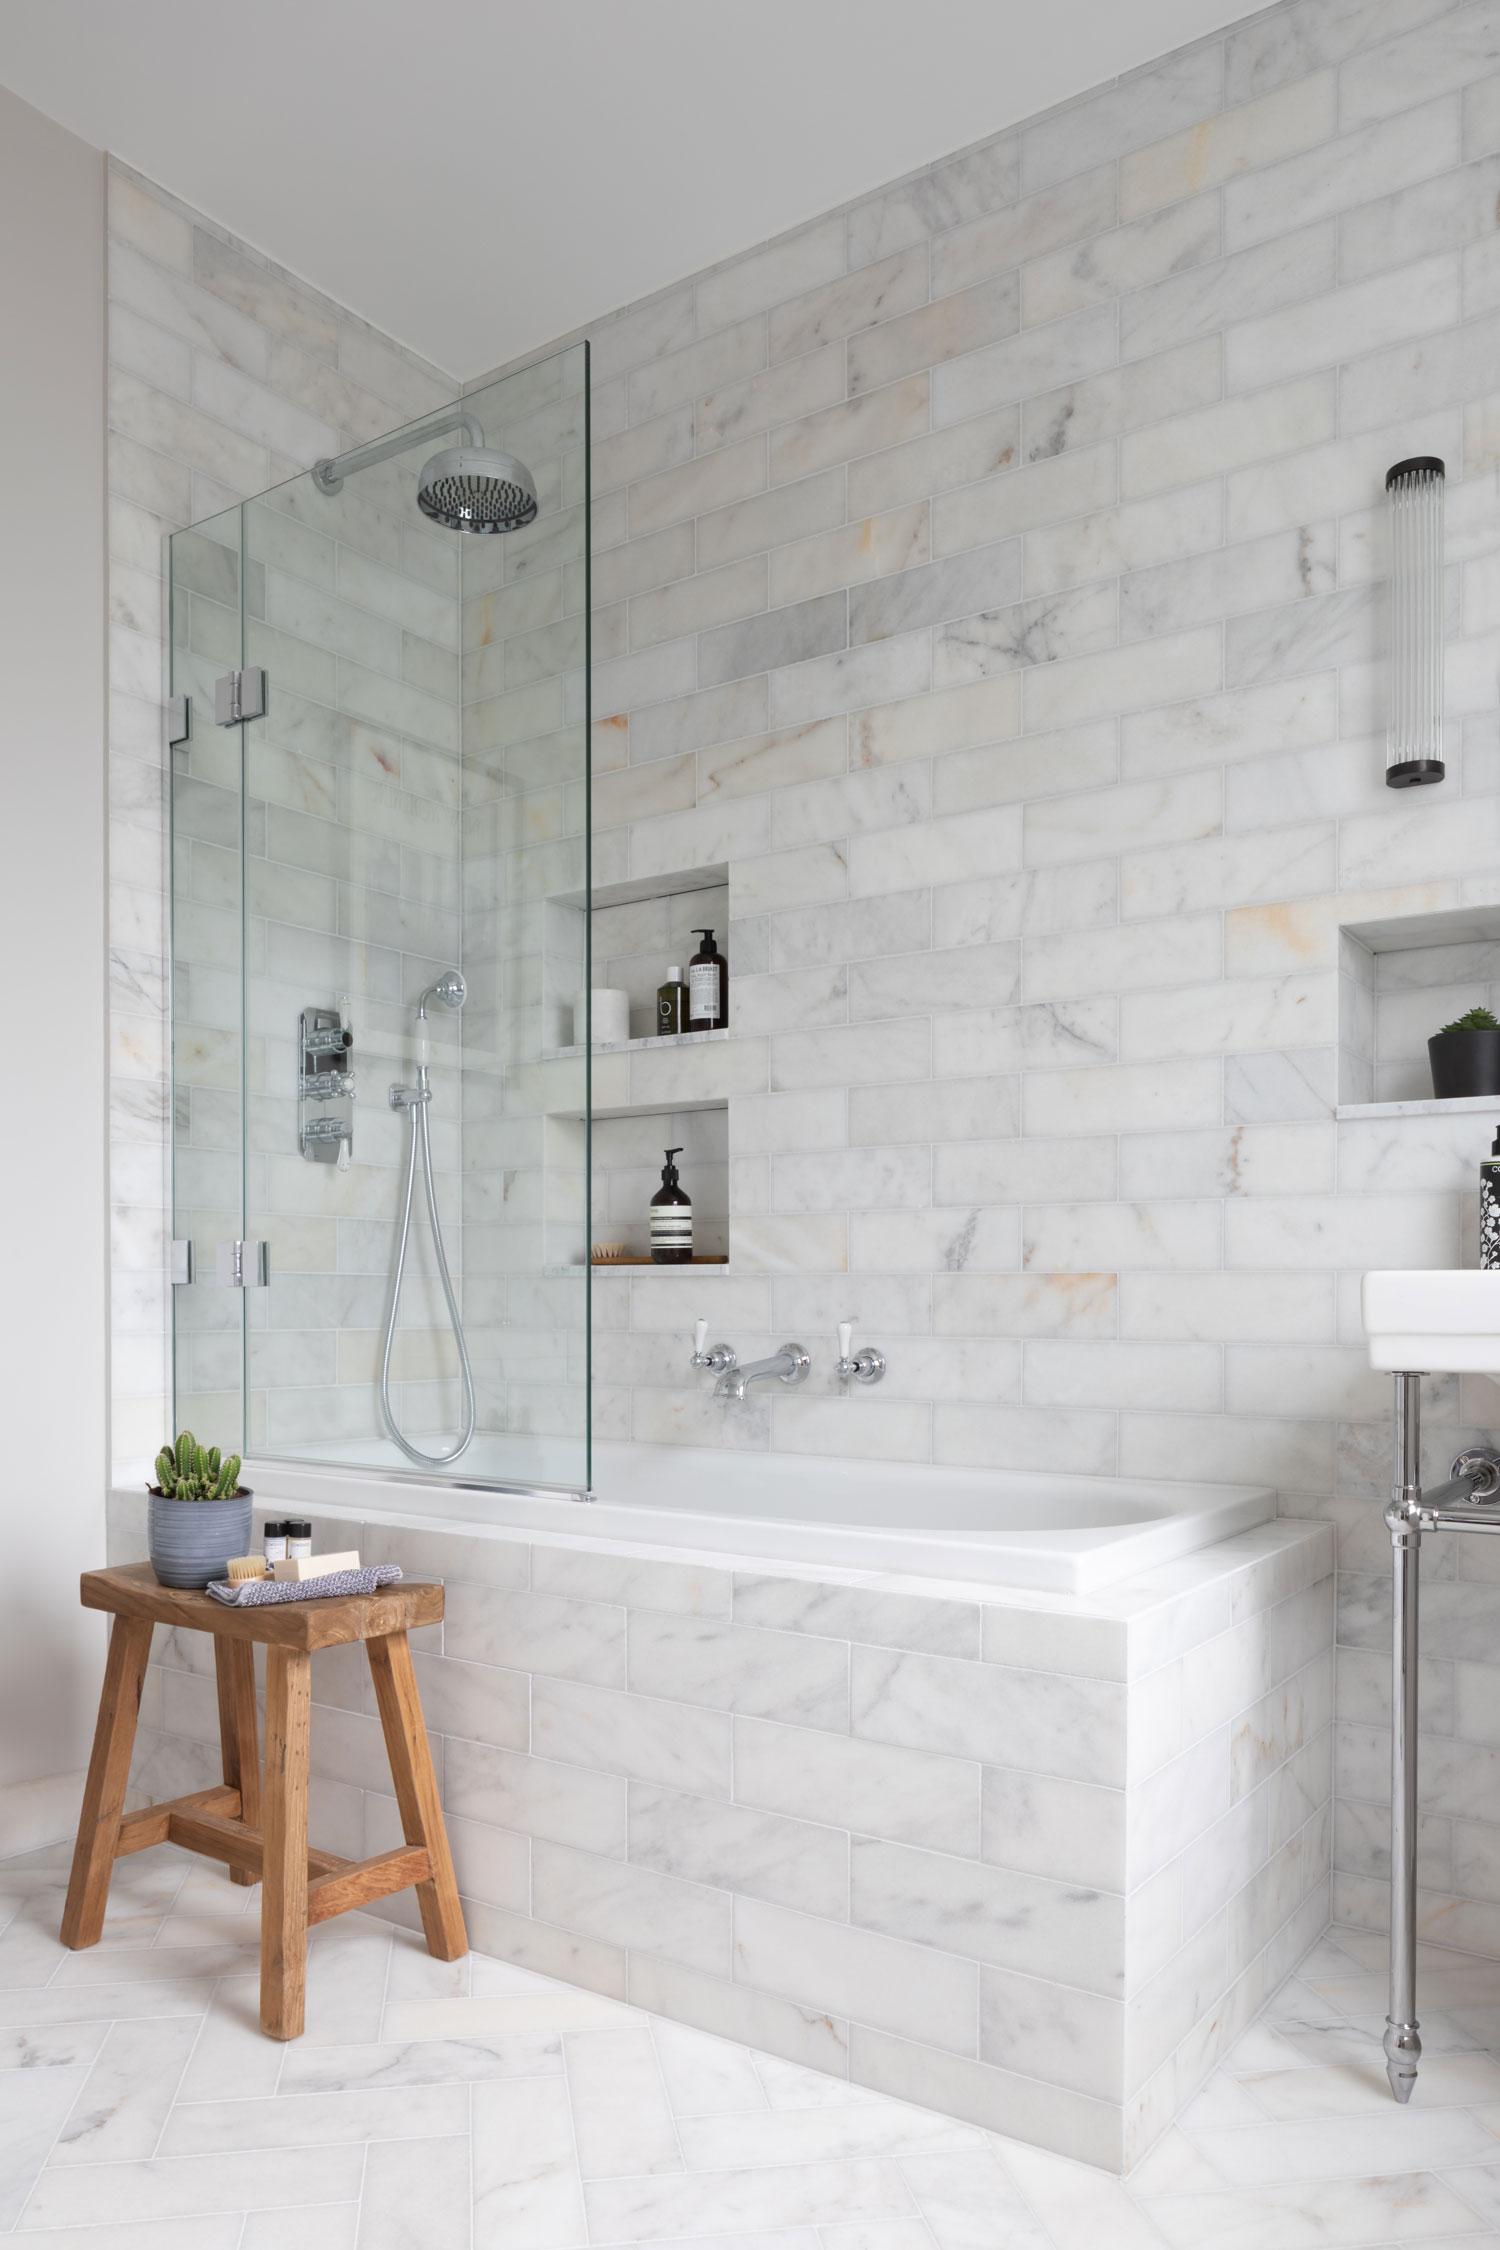 Shaw Loft bathroom – 24